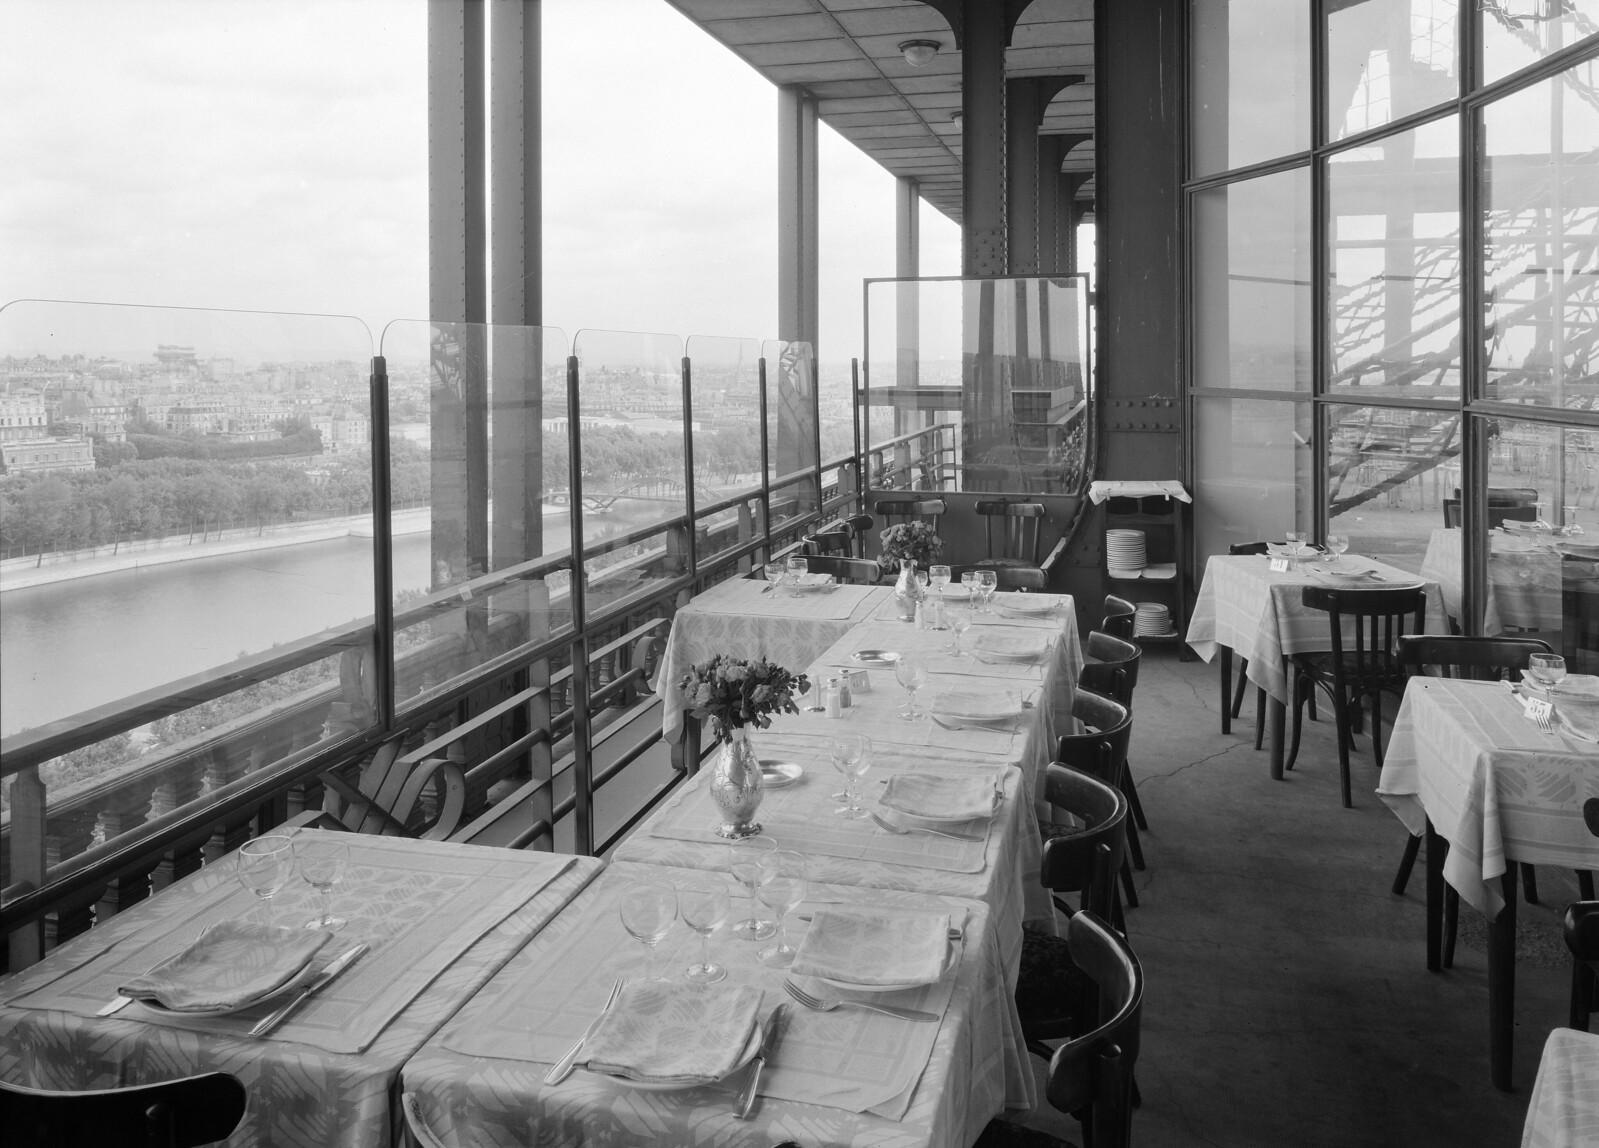 09.  Эйфелева башня. Терраса ресторана на втором этаже с видом на Сену (1)